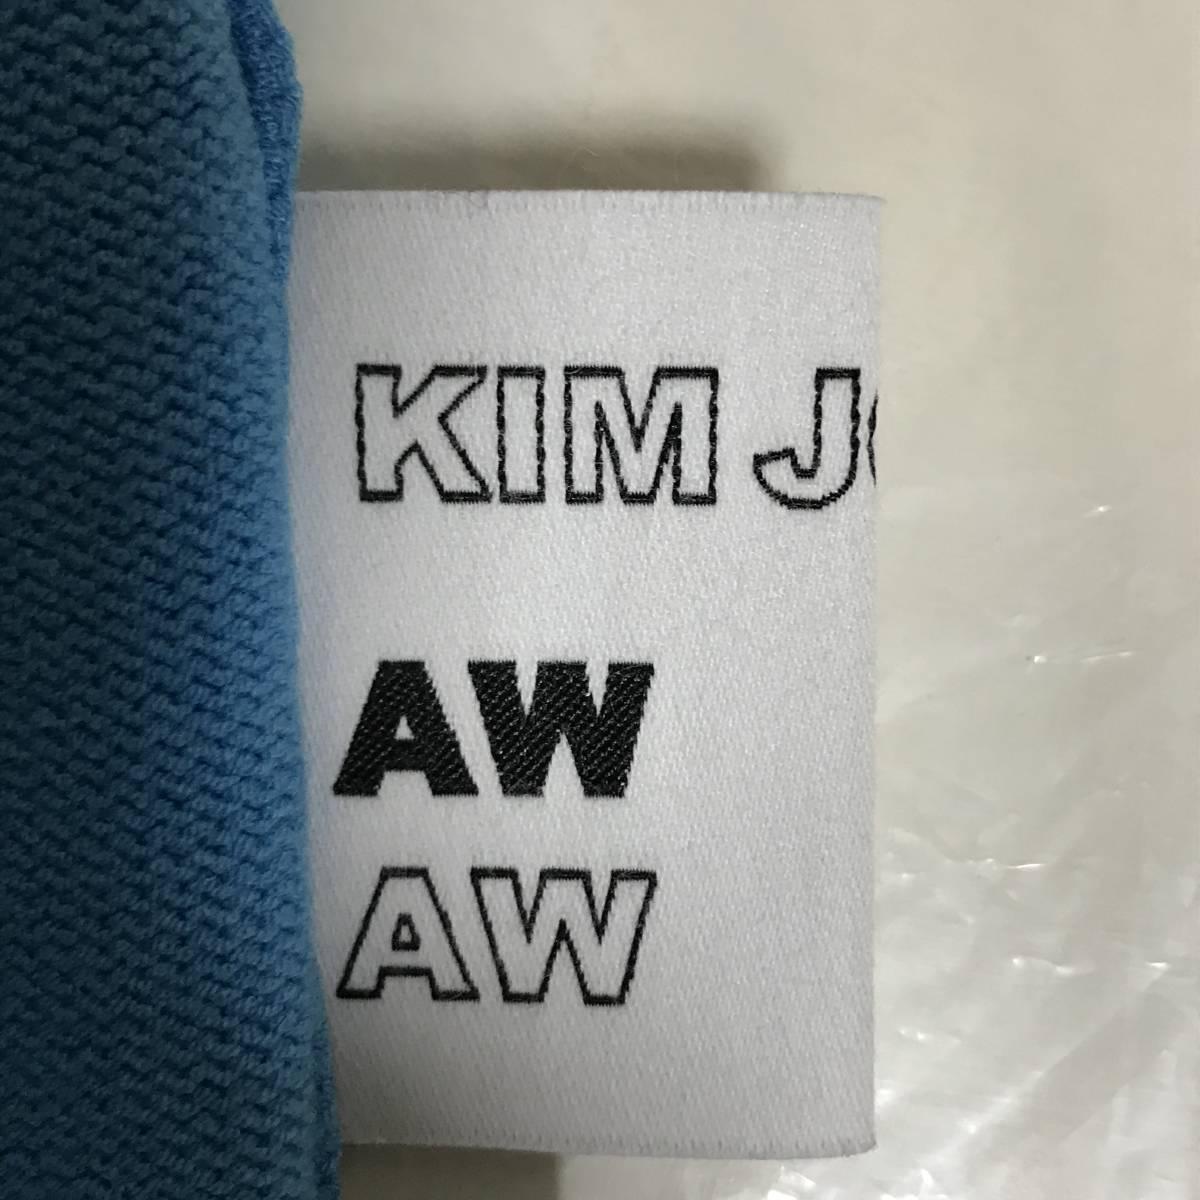 GU(ジーユー) - キム ジョーンズ(KIM JONES) カラーブロックセーター(長袖)(KJ) ブルー Lサイズ (完売品・新品未着用品)_内側サイドタグ